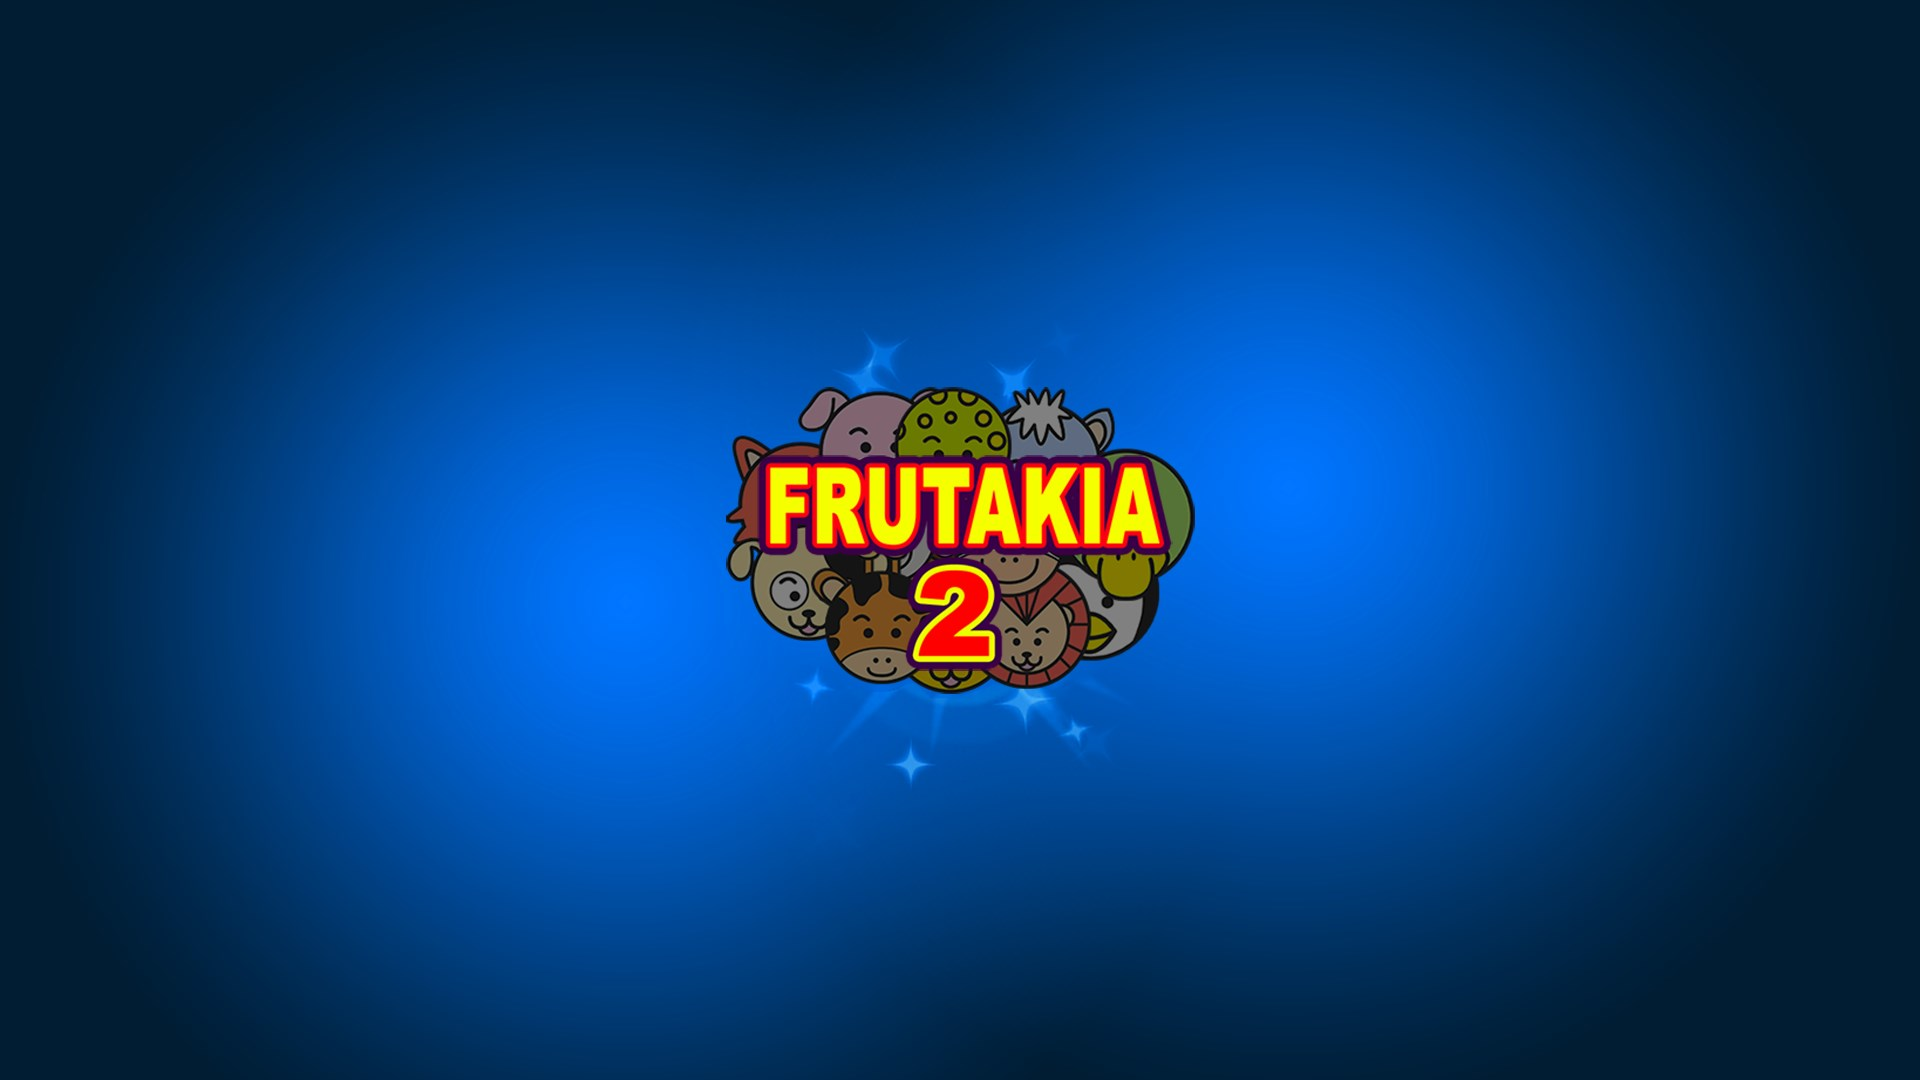 Buy Frutakia 2 Premium - Microsoft Store